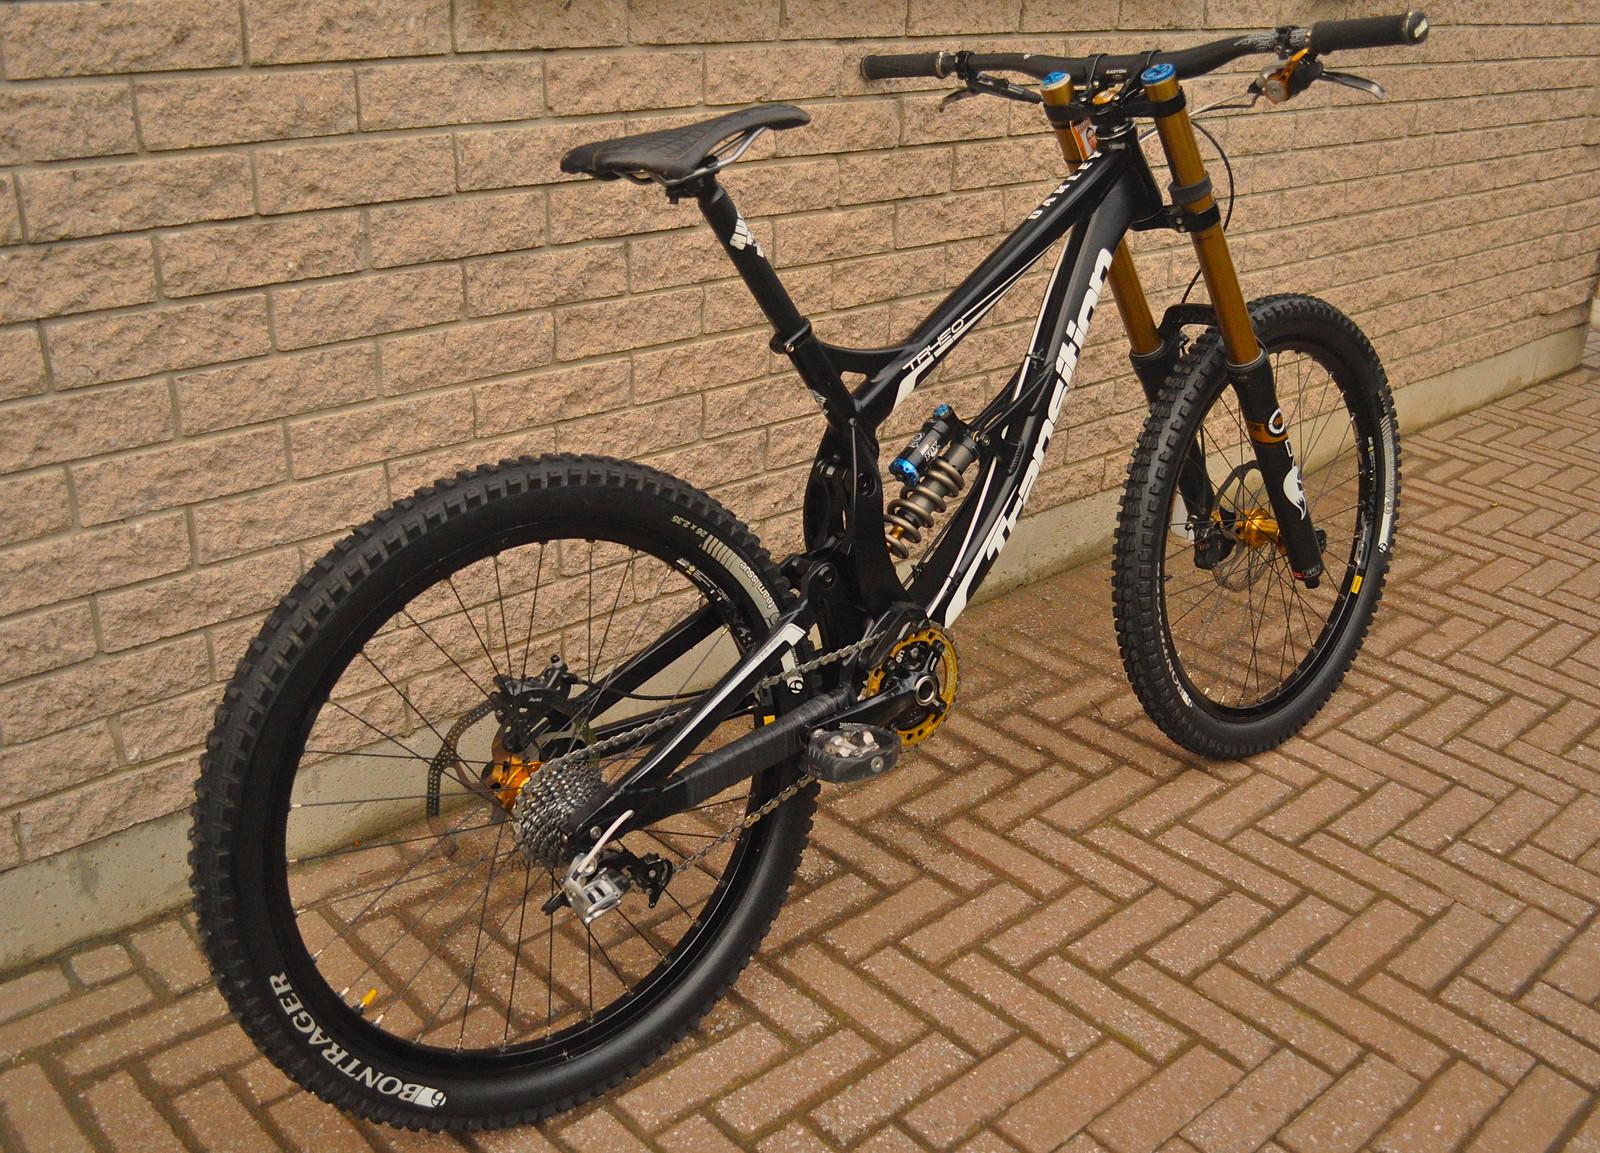 DSC 0015 - Phil_DH - Mountain Biking Pictures - Vital MTB